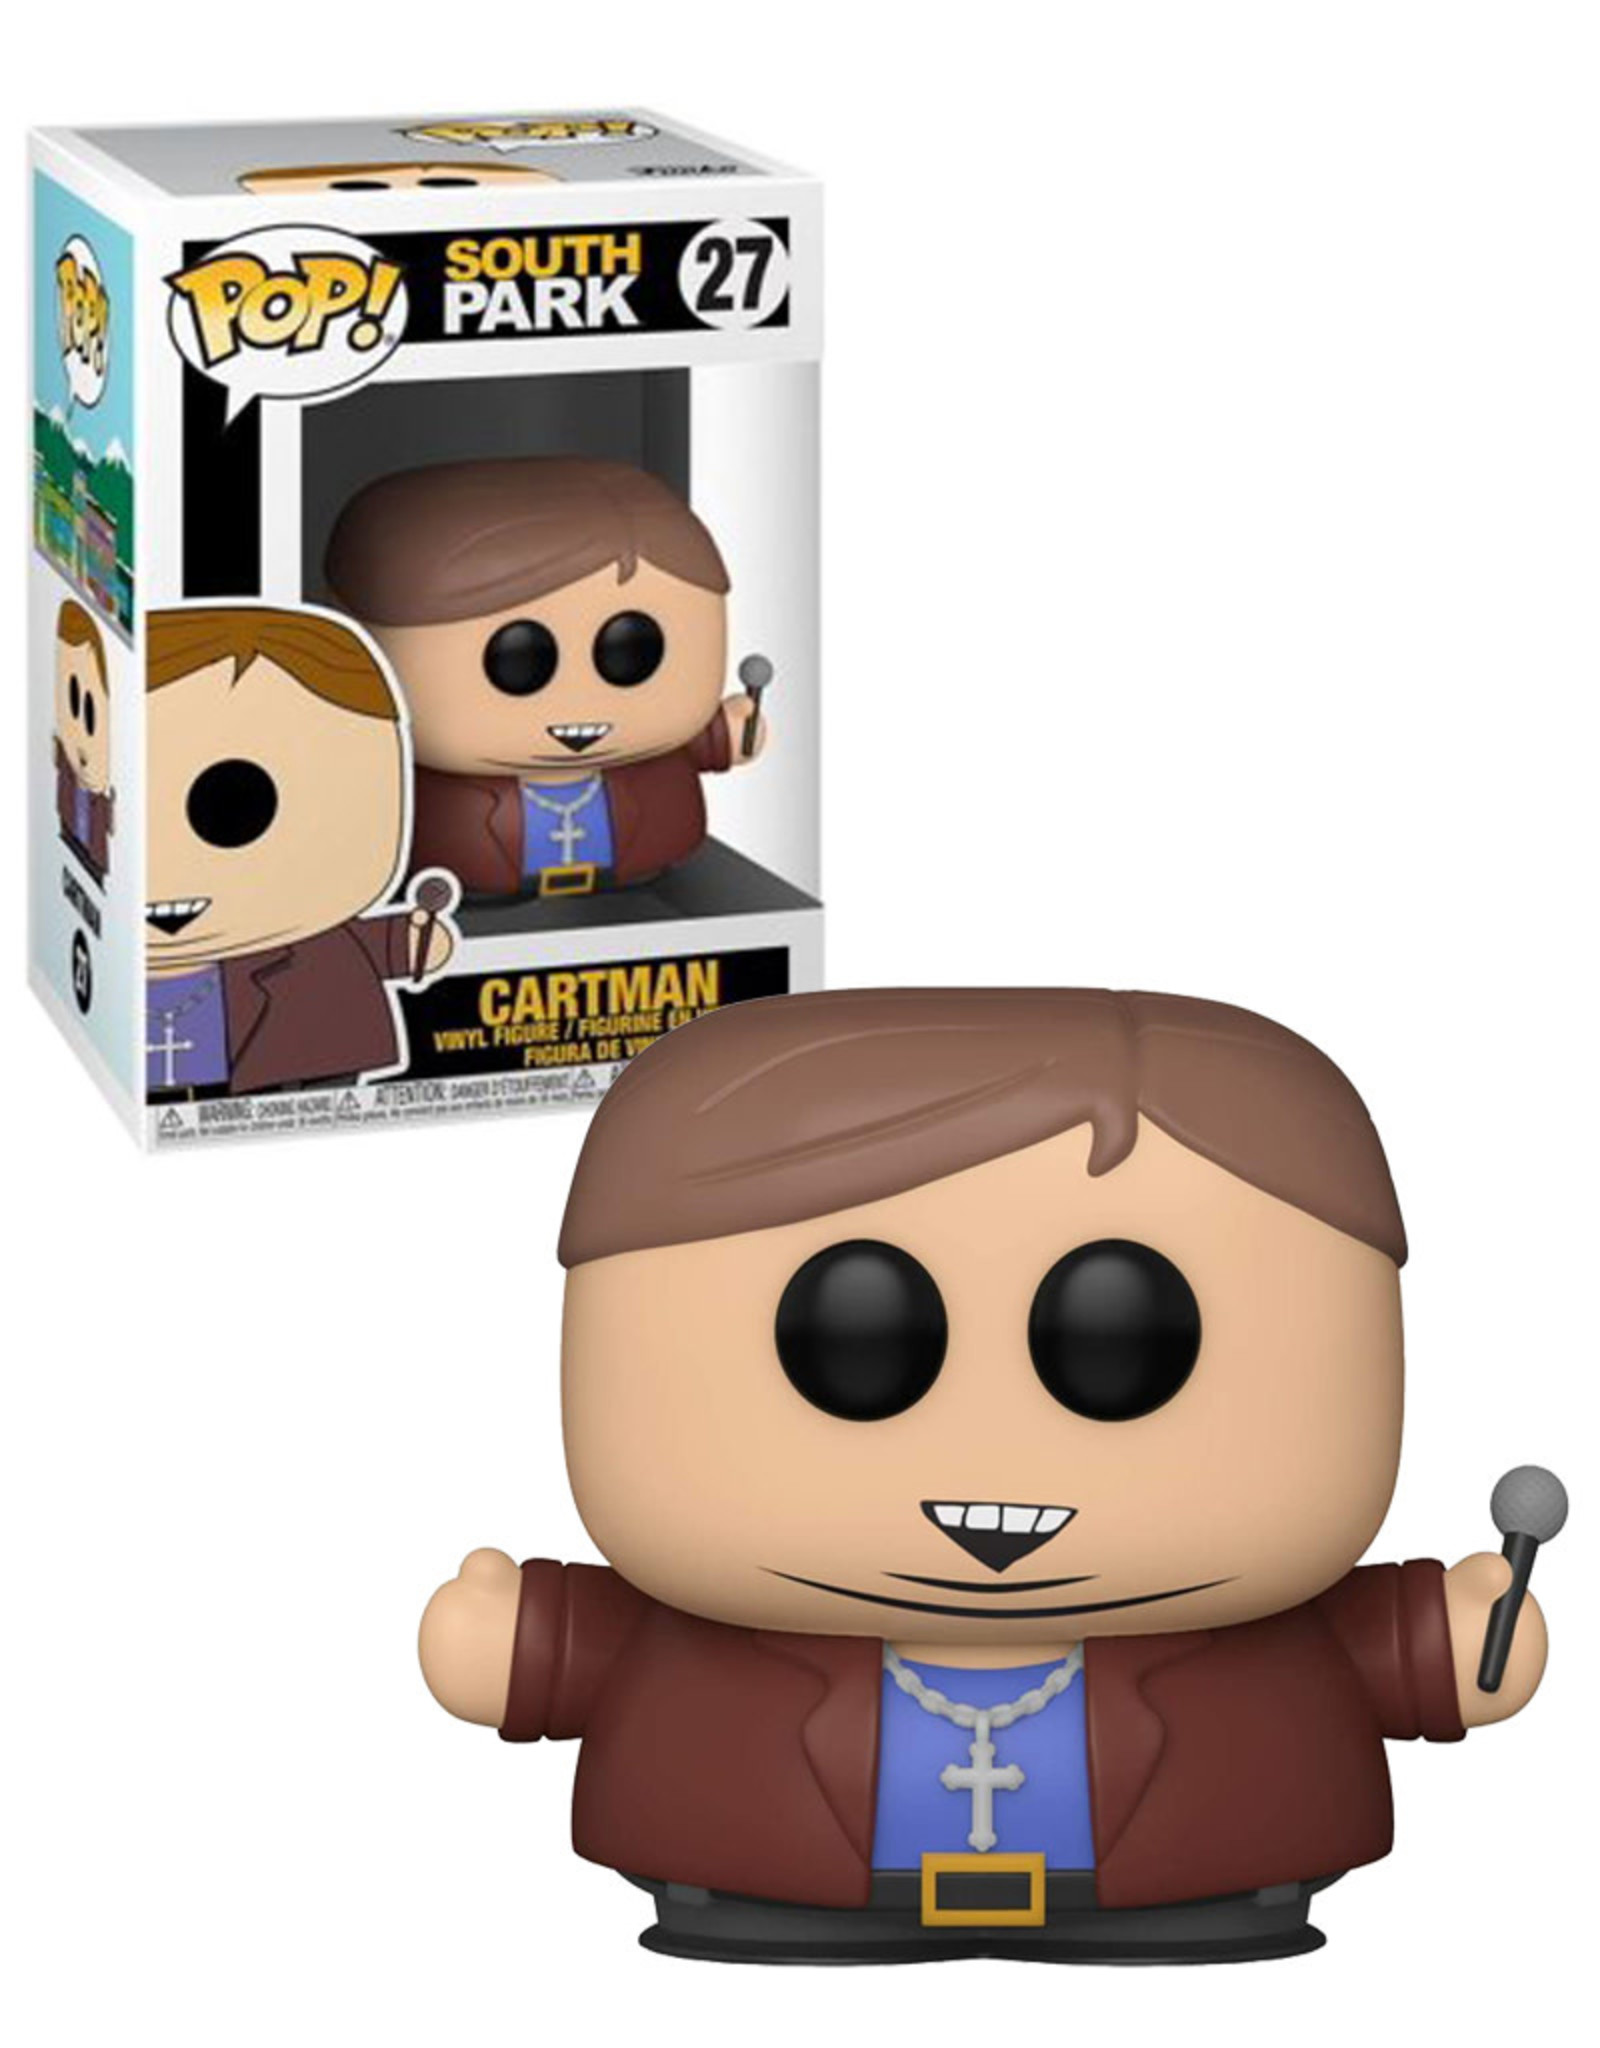 South Park 27 ( Funko Pop ) Cartman